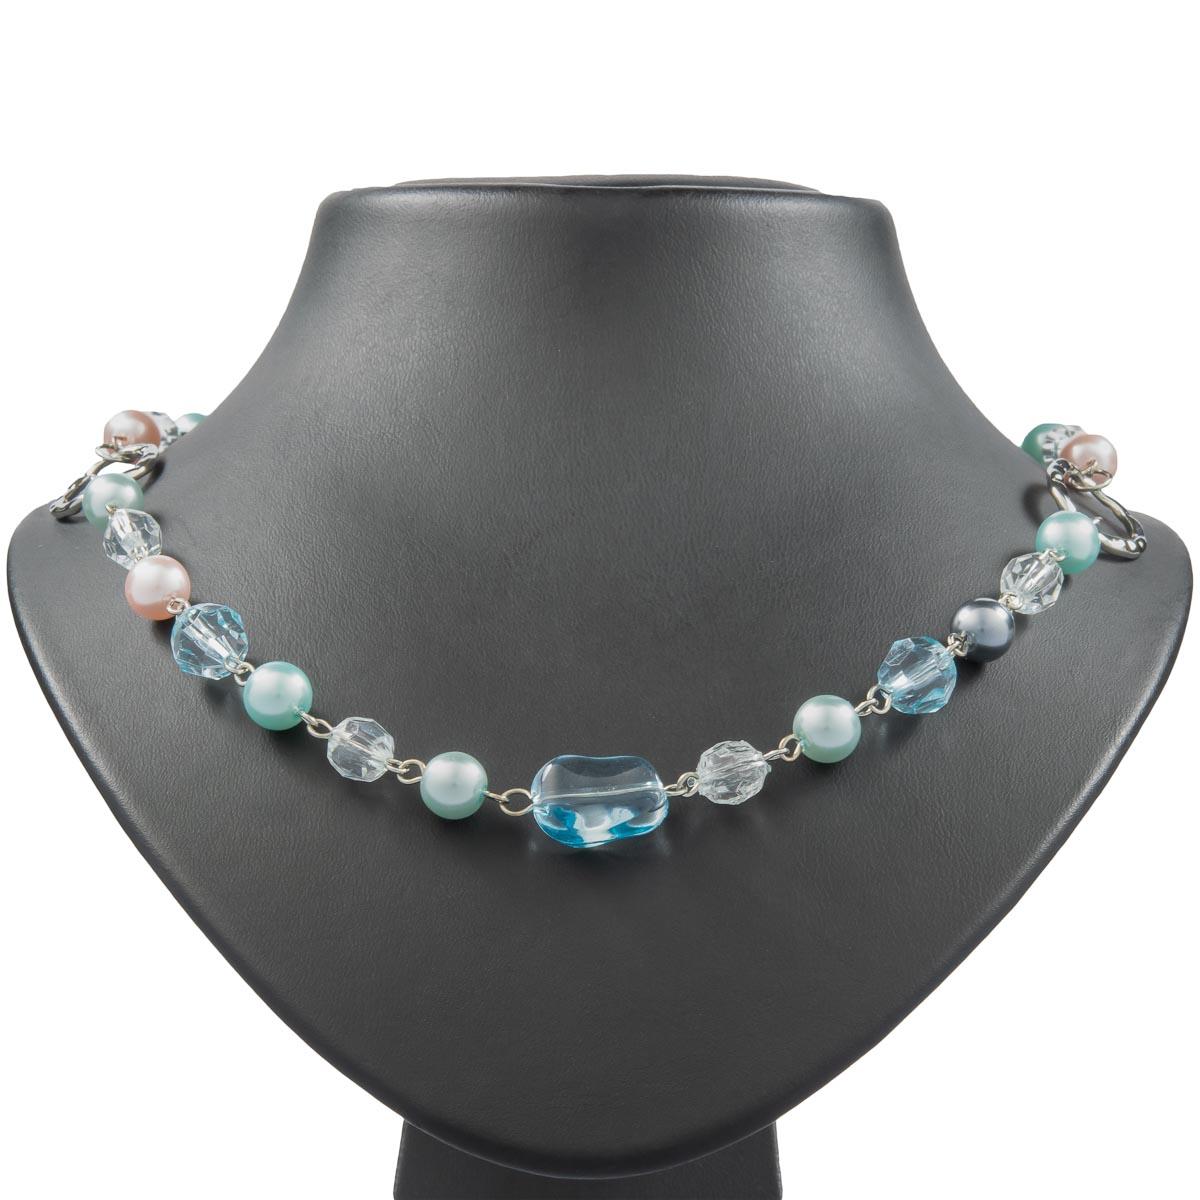 Damen Design Halskette RP009